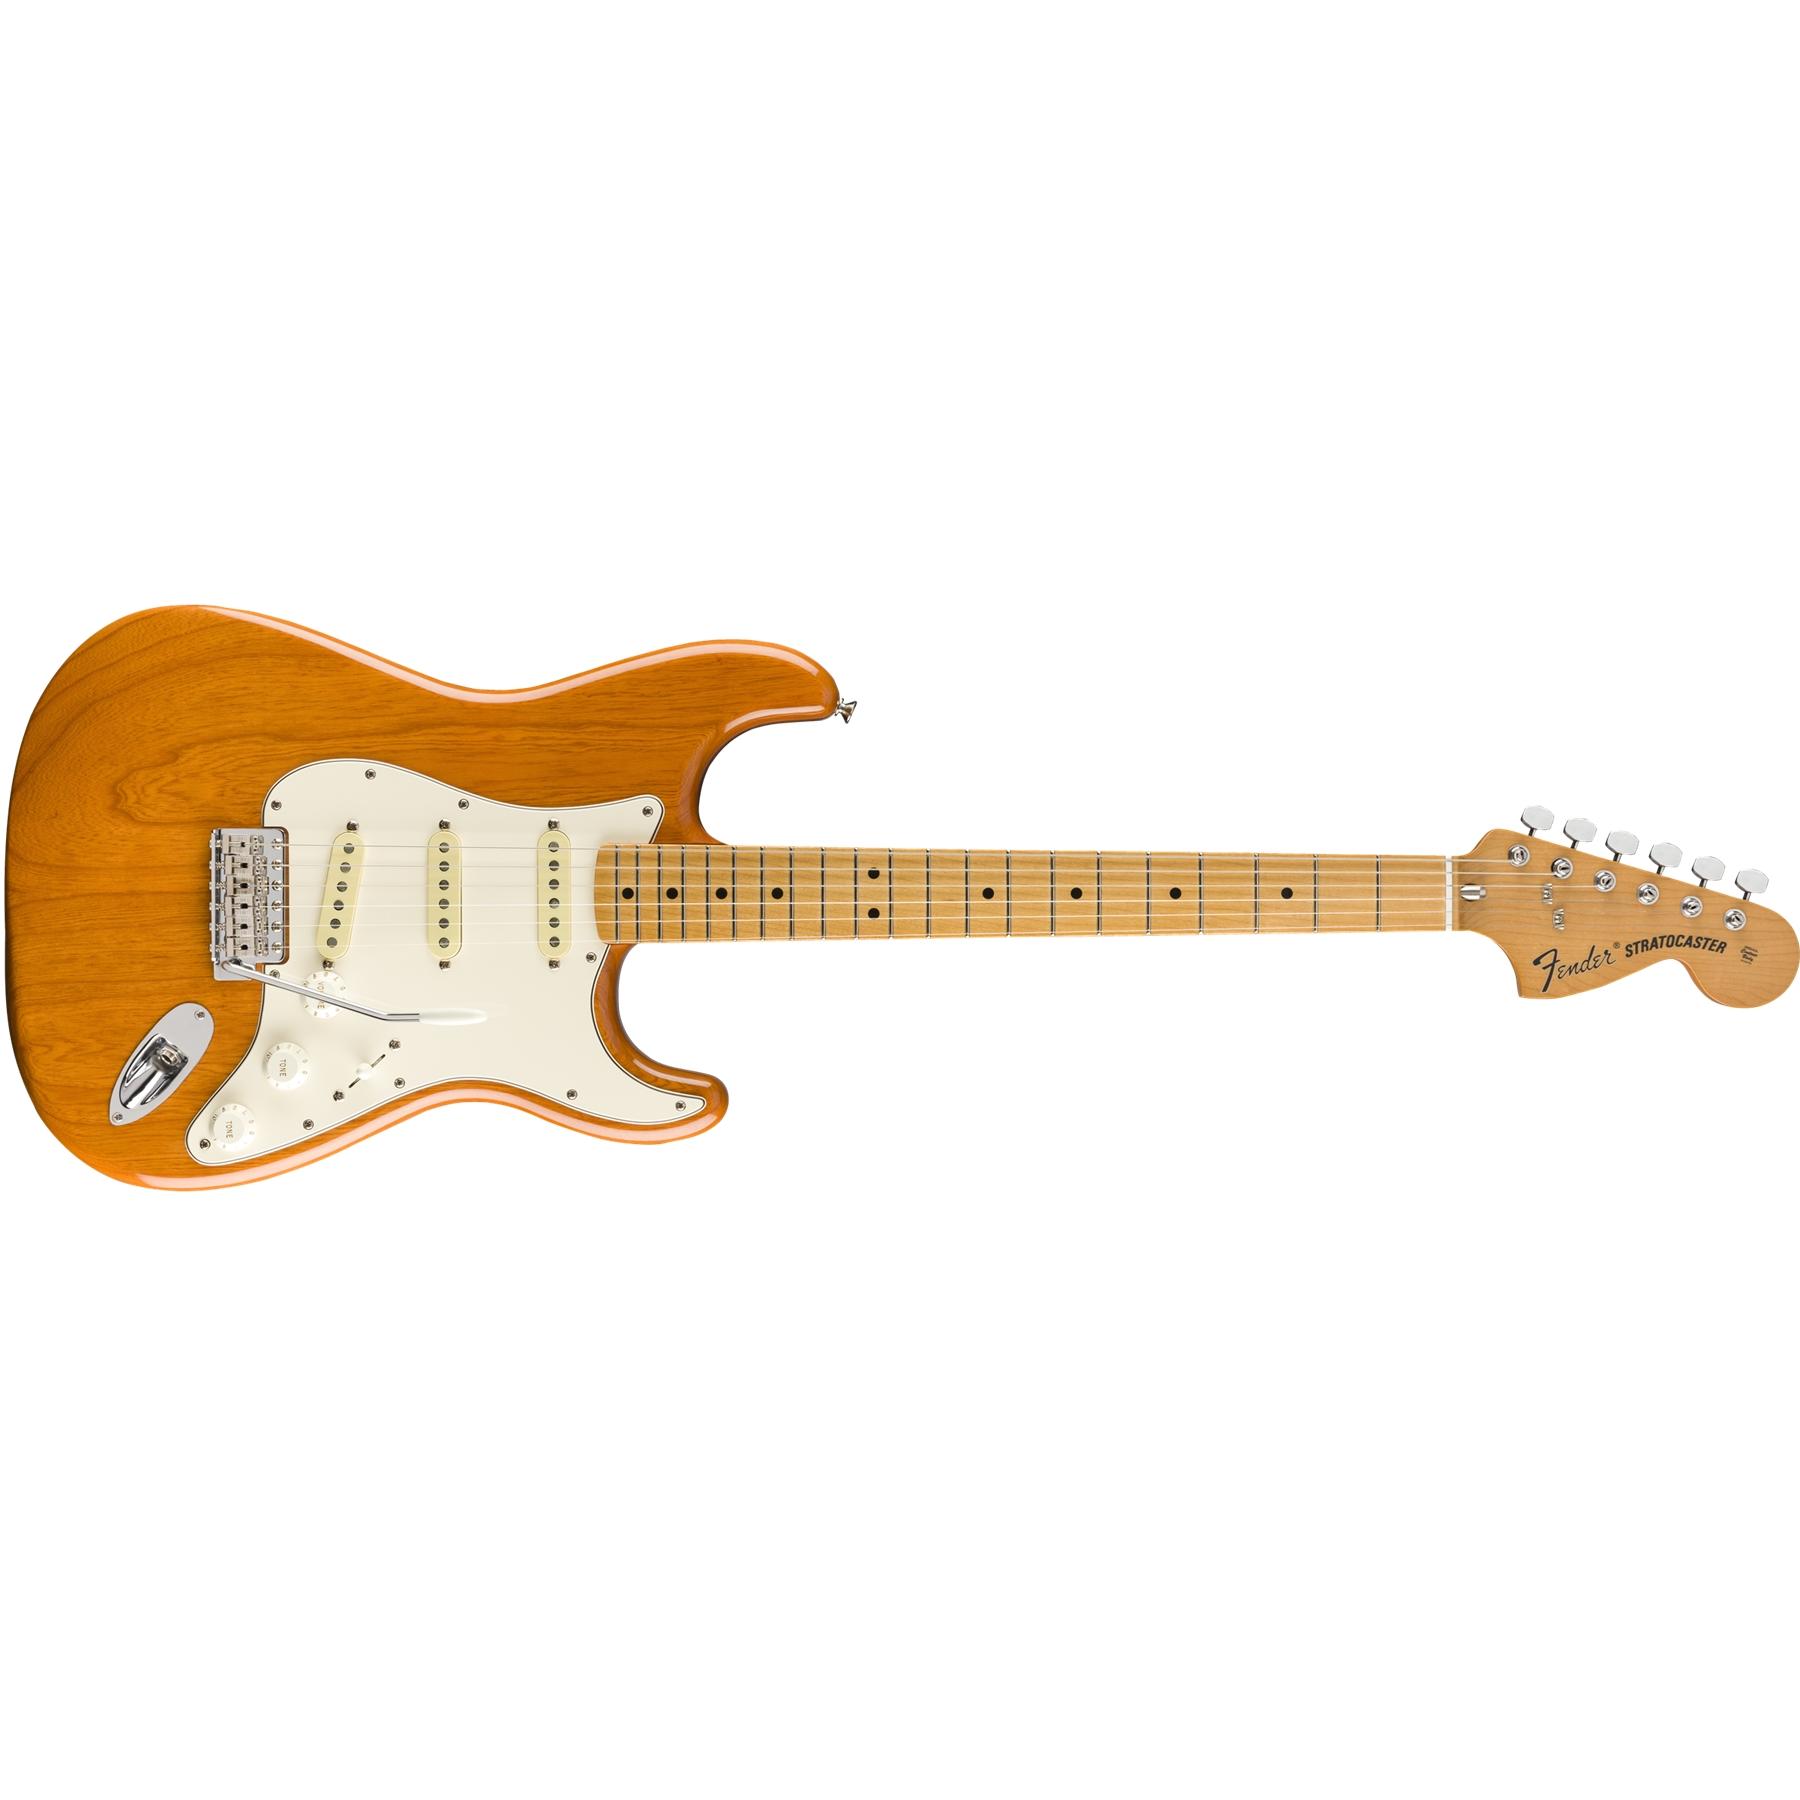 FENDER-Vintera-70s-Stratocaster-MN-Aged-Natural-sku-23940